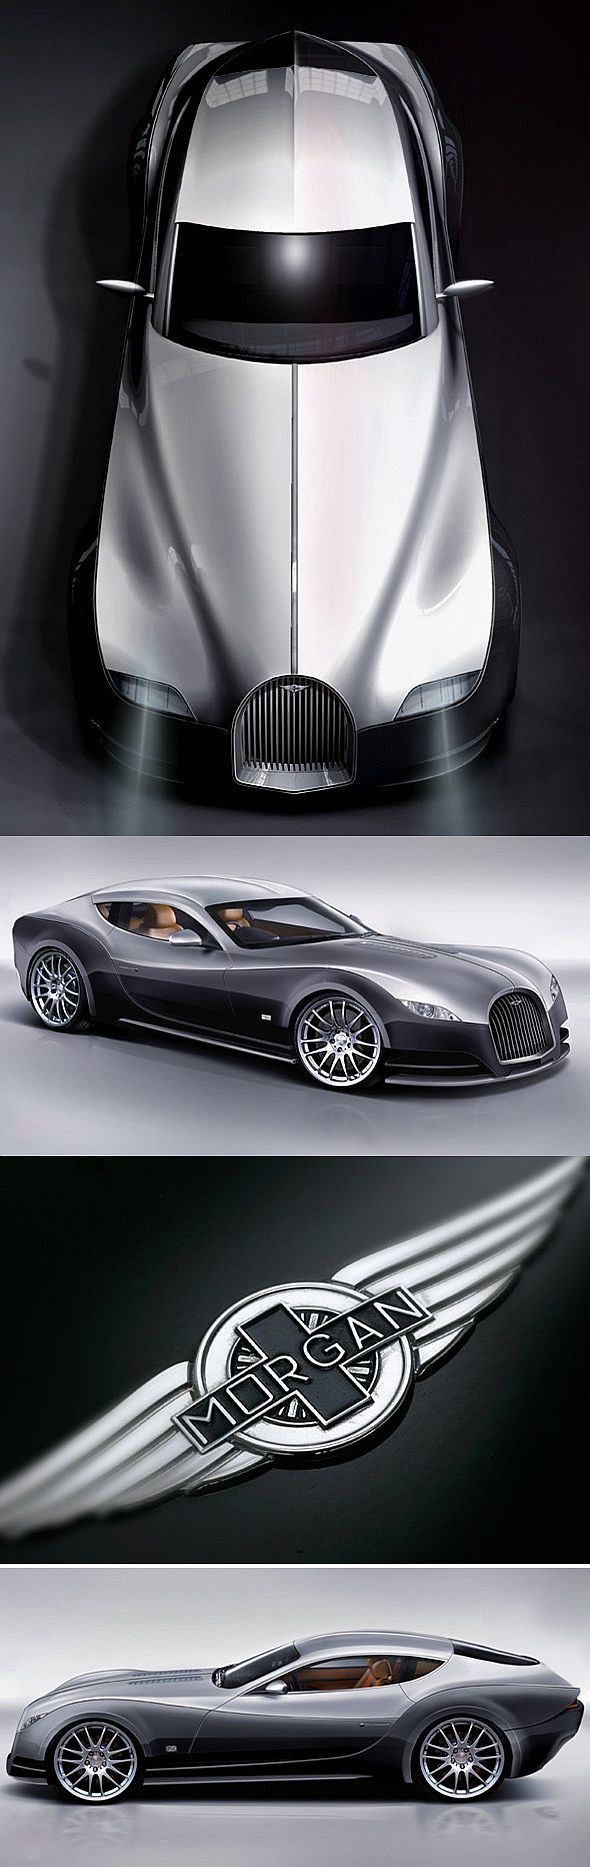 The 25 best morgan automobile ideas on pinterest morgan cars morgan evagt 2010 vanachro Images